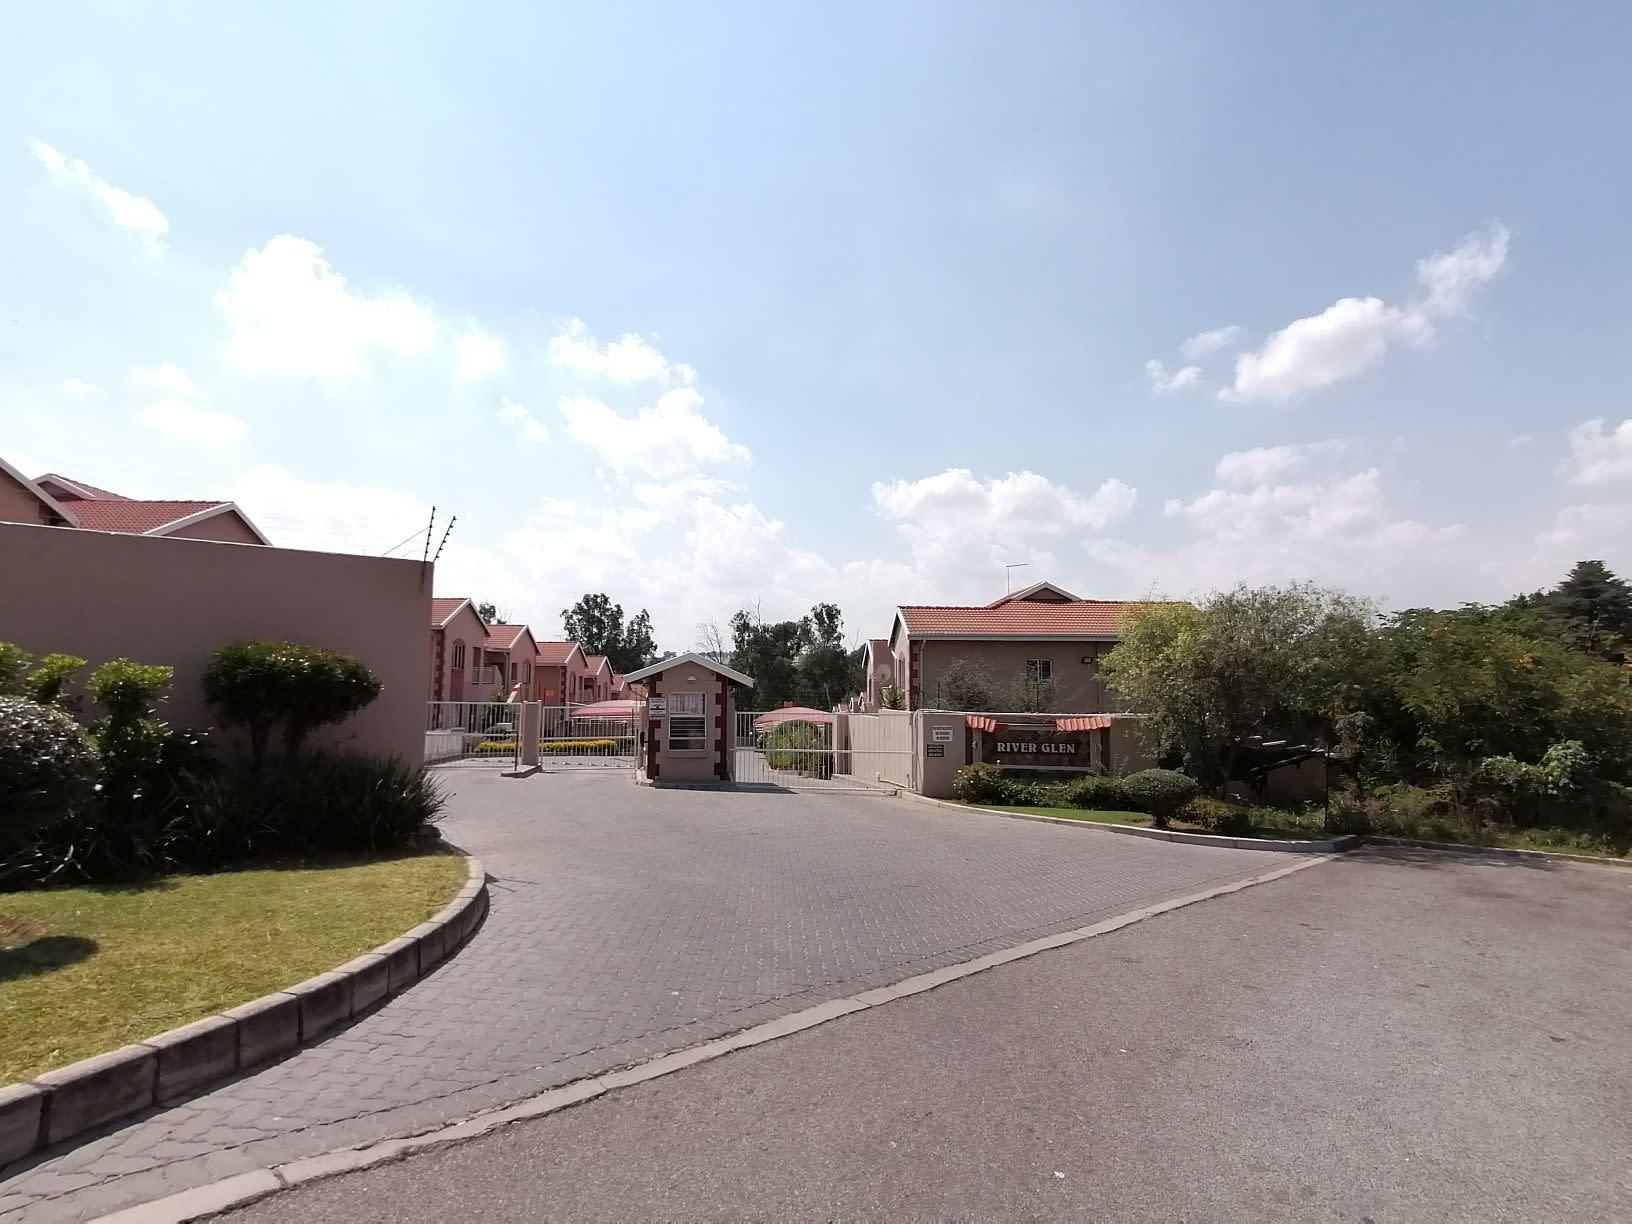 2 Bedroom Apartment To Rent In Buccleuch Sandton Gauteng Just Property